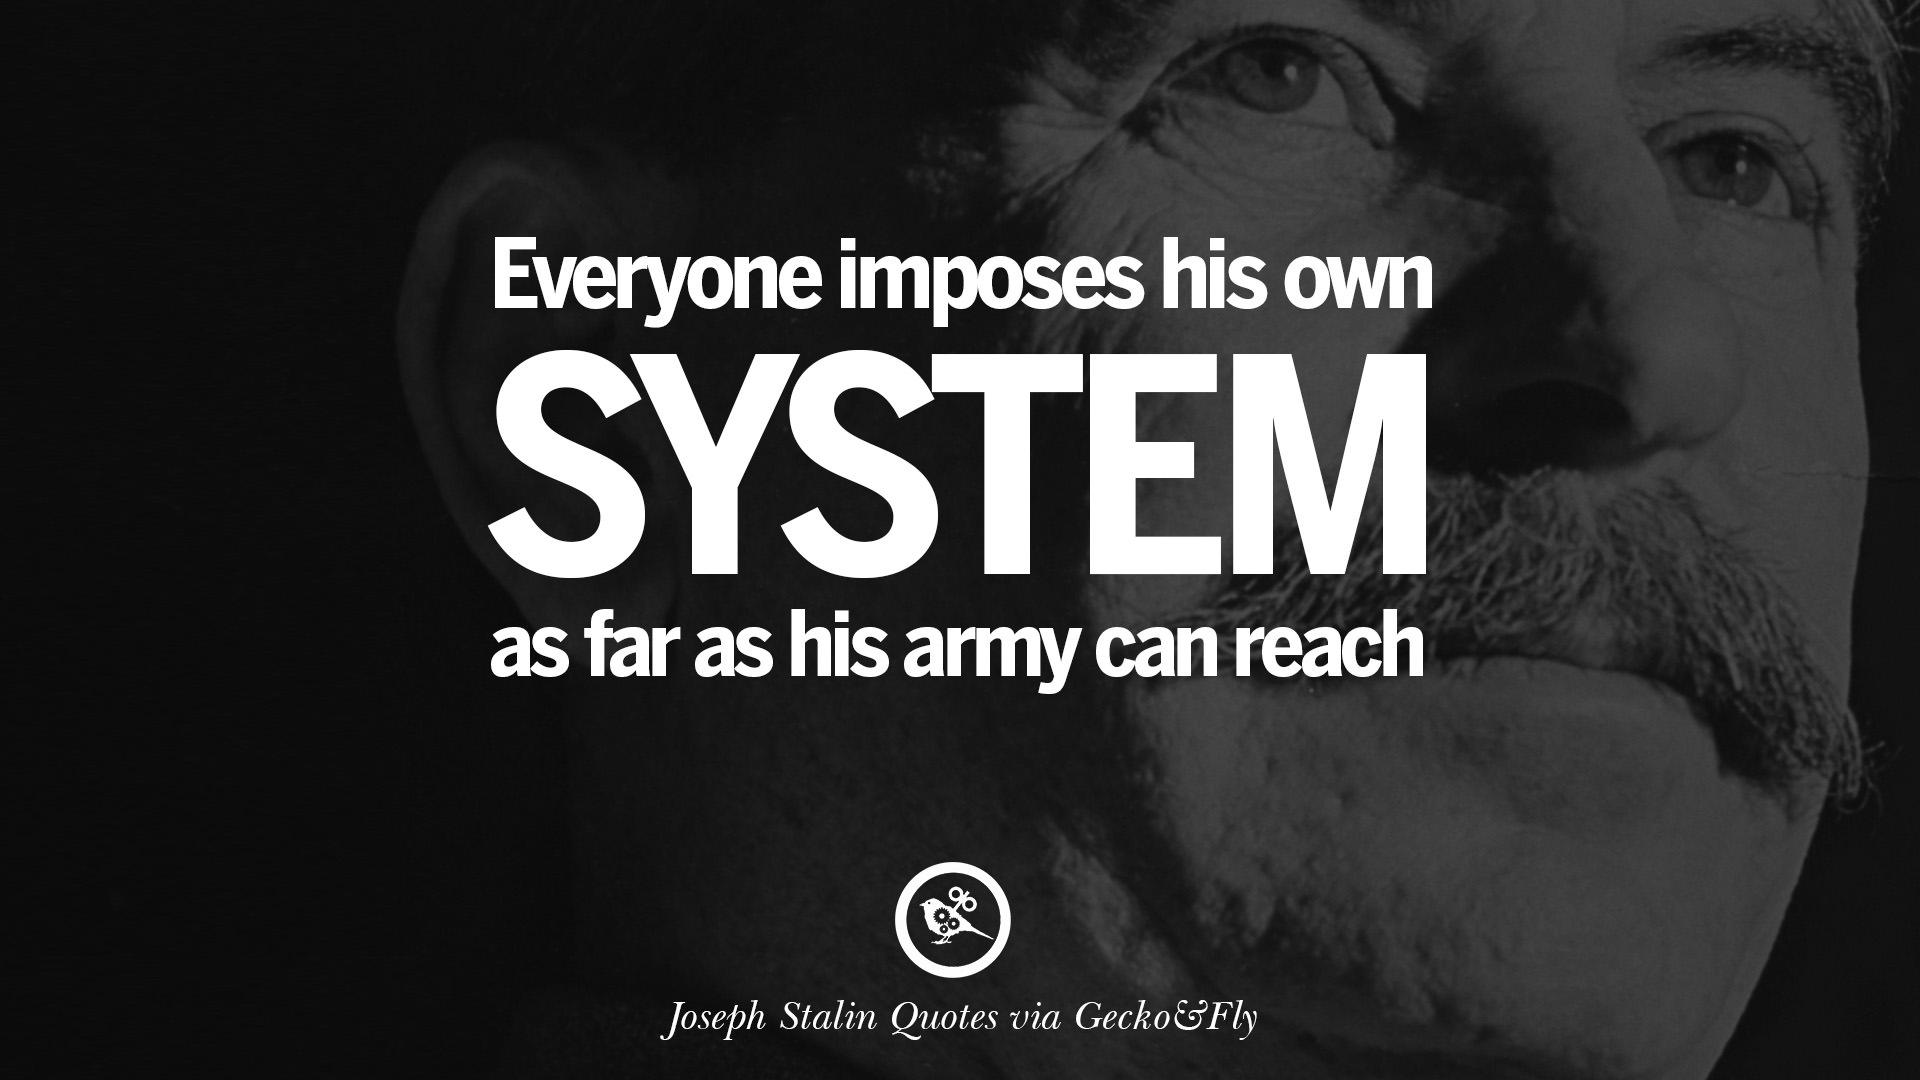 14 joseph stalin quotes on communism freedom power